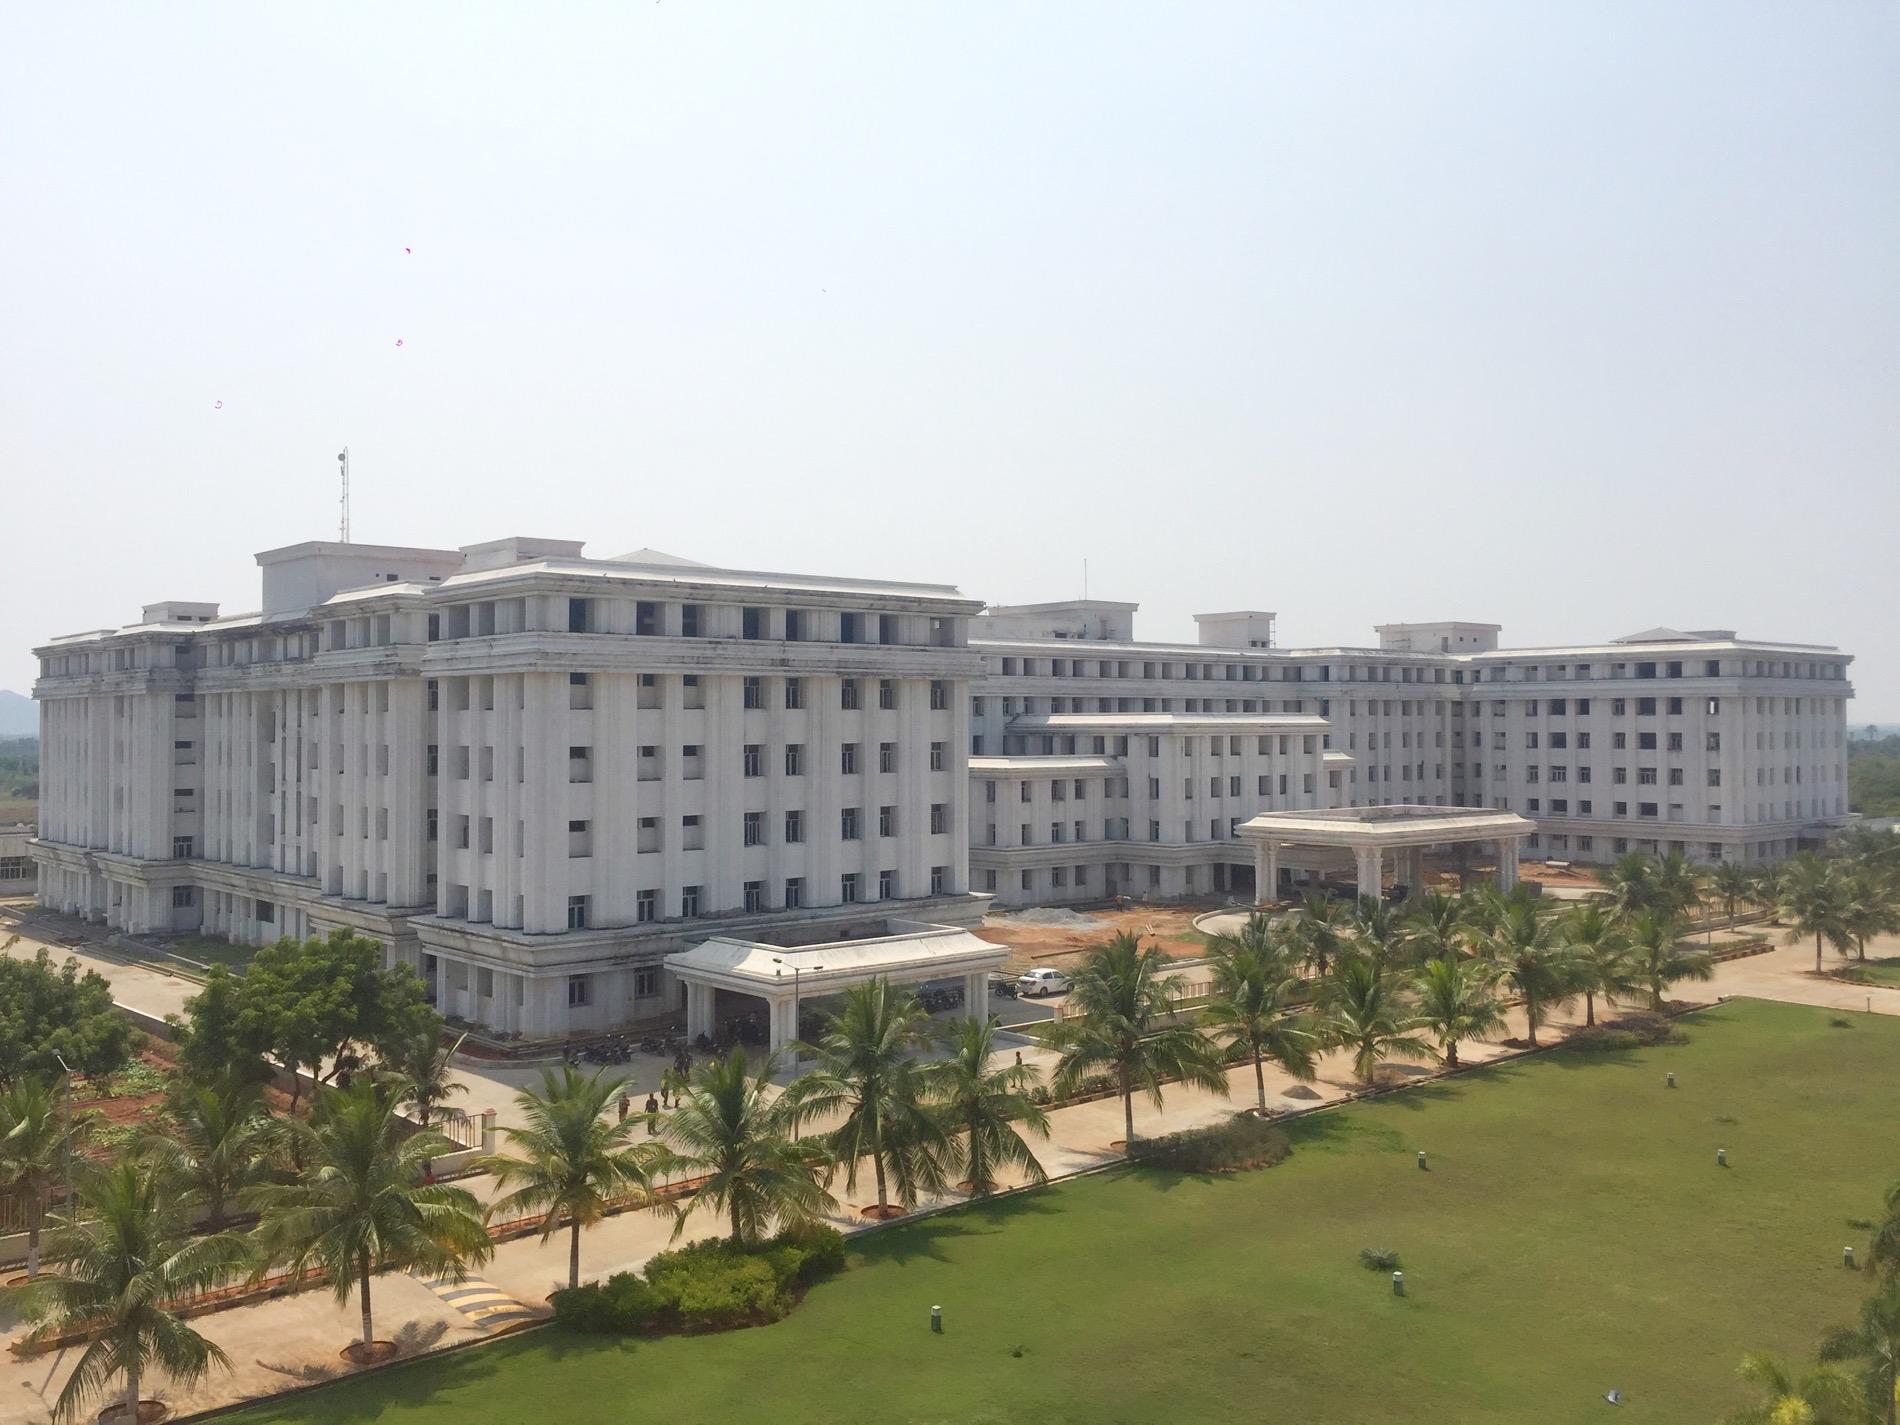 Melmaruvathur Adhiparasakthi Institute of Medical Sciences and Research, Kanchipuram Image